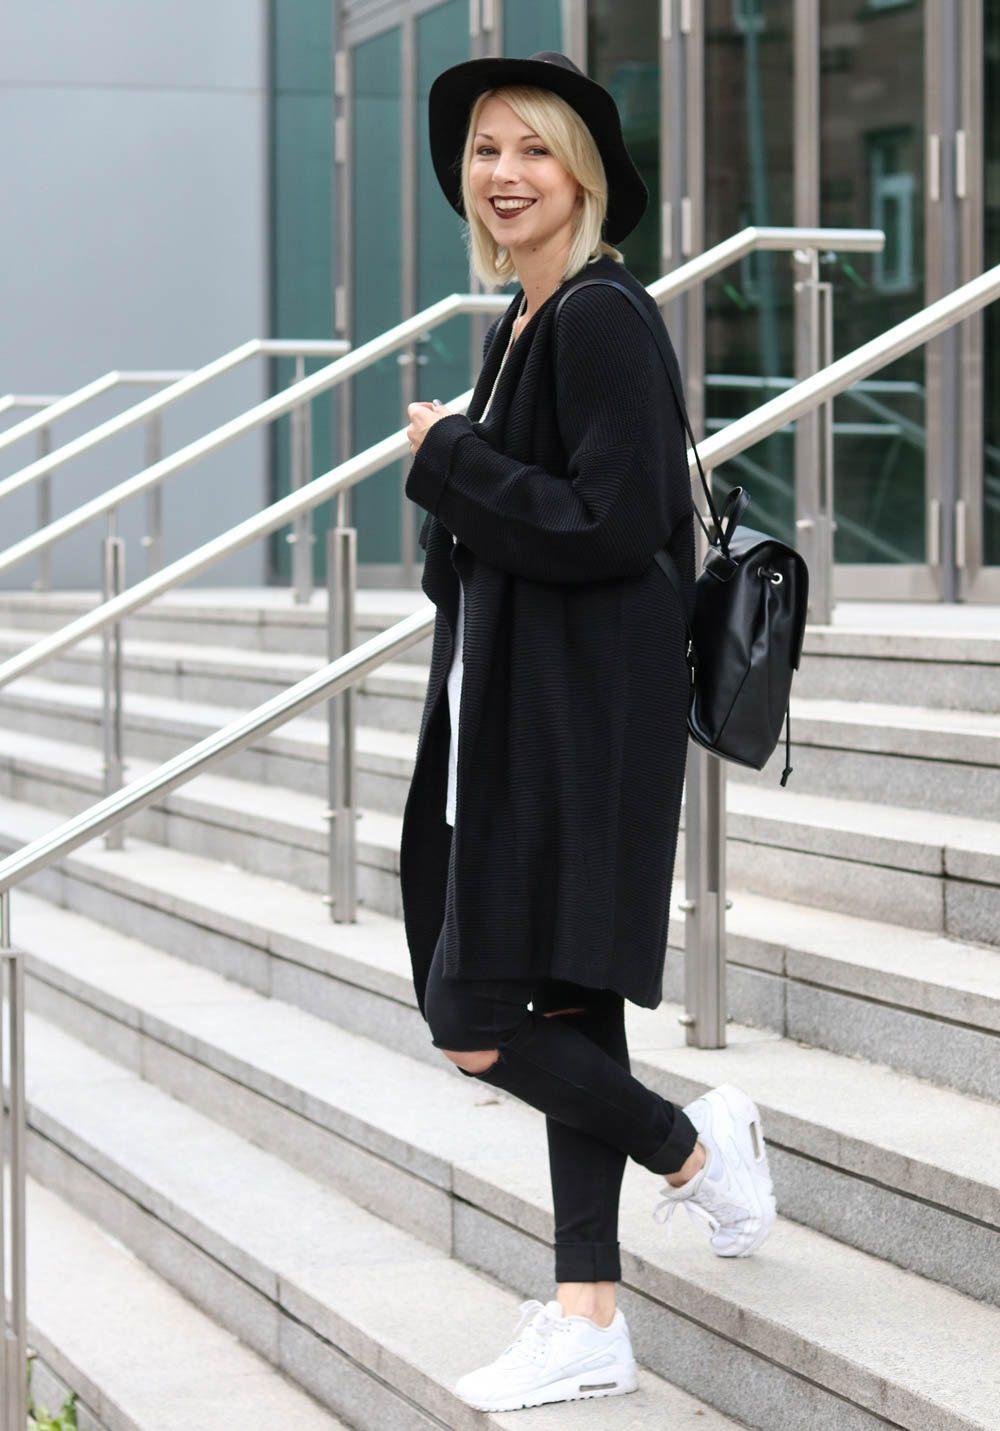 fashionblogger-mannheim-outfit-longcardigan-nike-air-max-skinnyjeans-rucksack-2-von-20